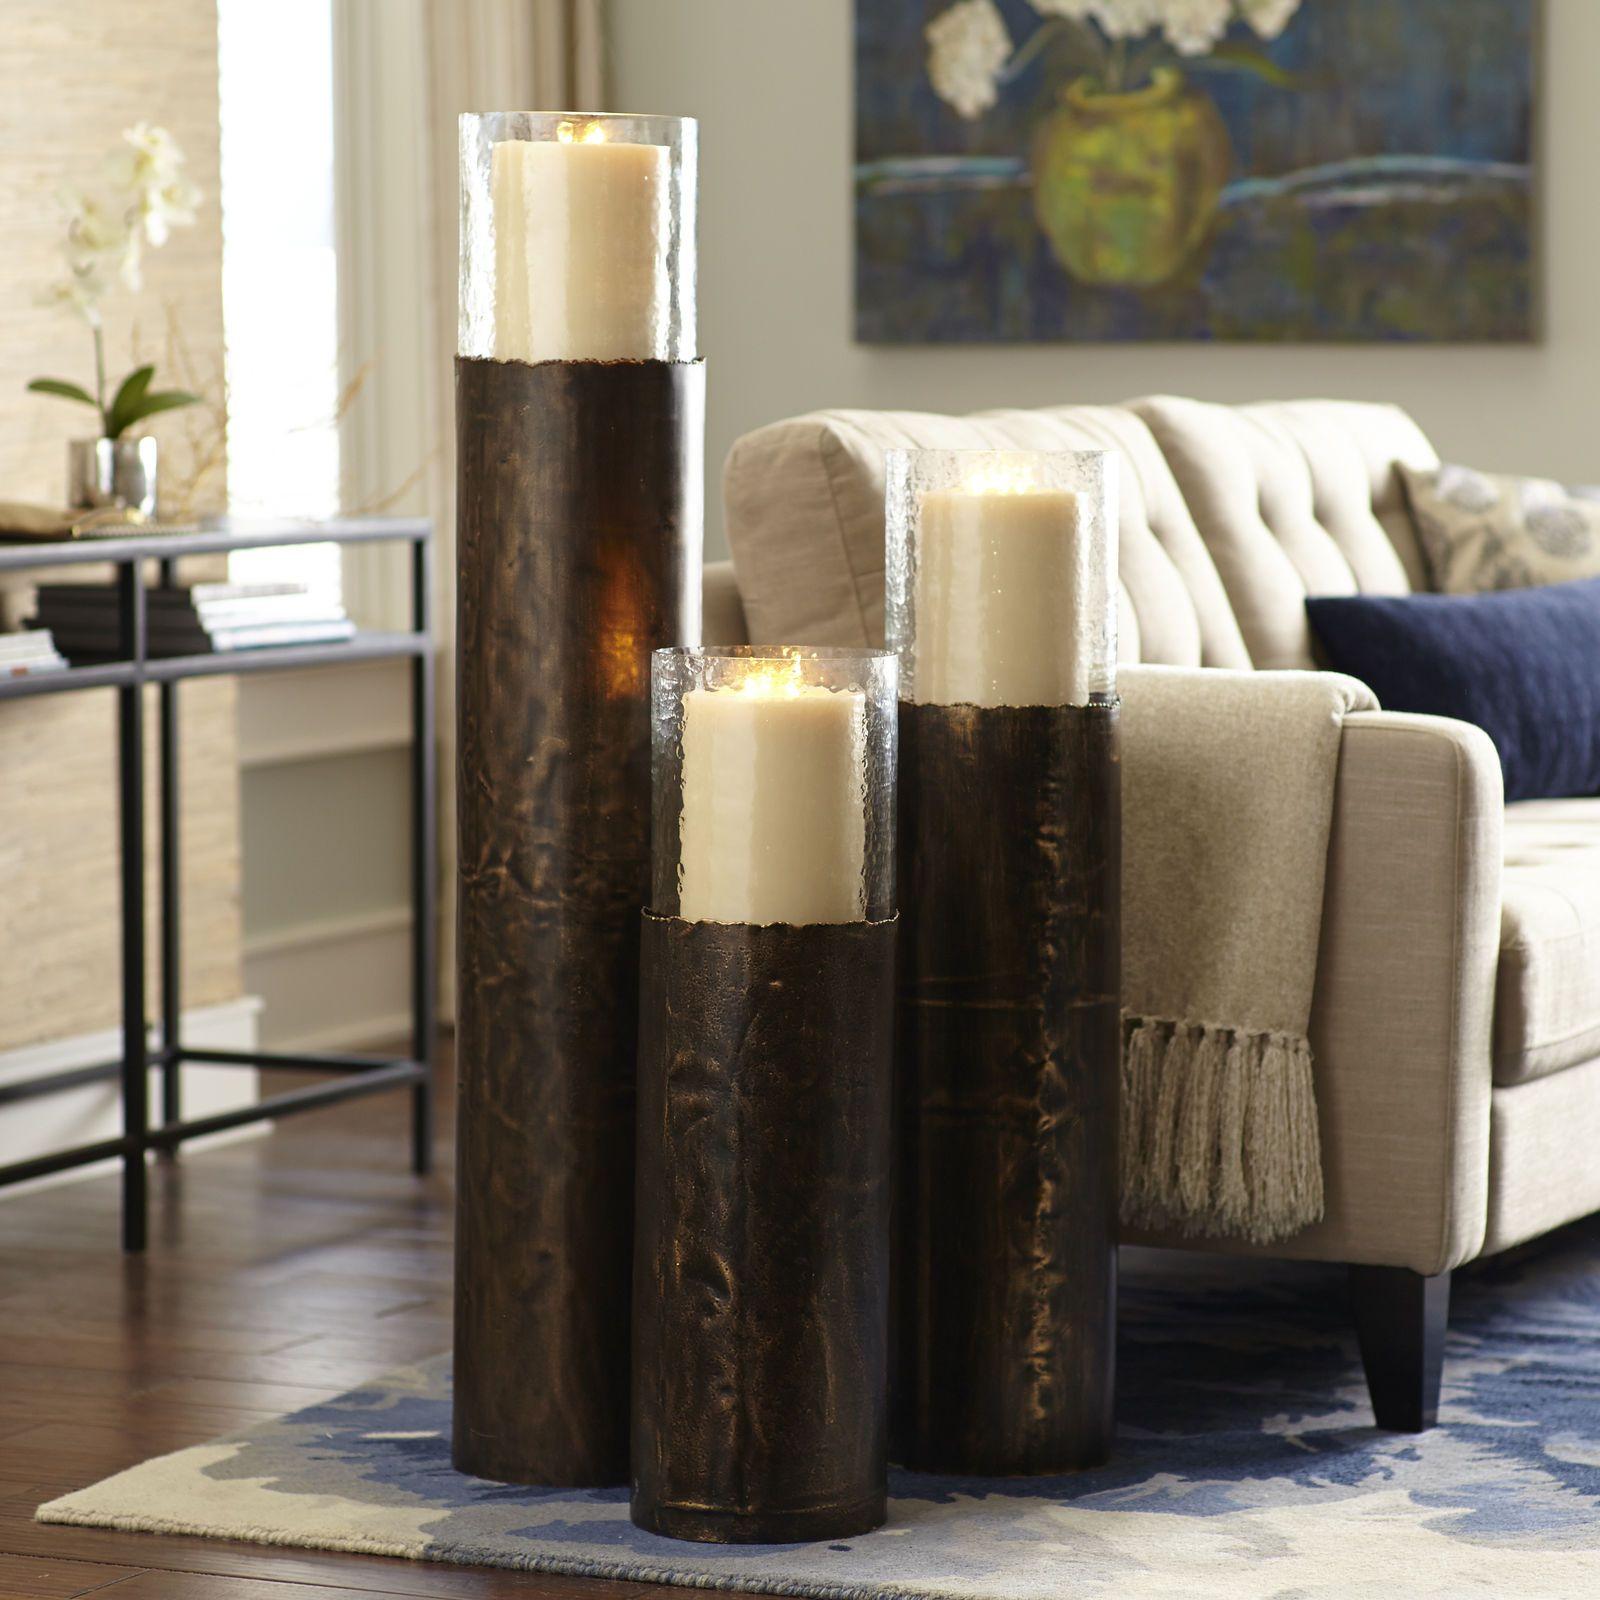 Copper Leaf Floor Pillar Holders Floor Candle Floor Candle Holders Large Floor Candle Holders